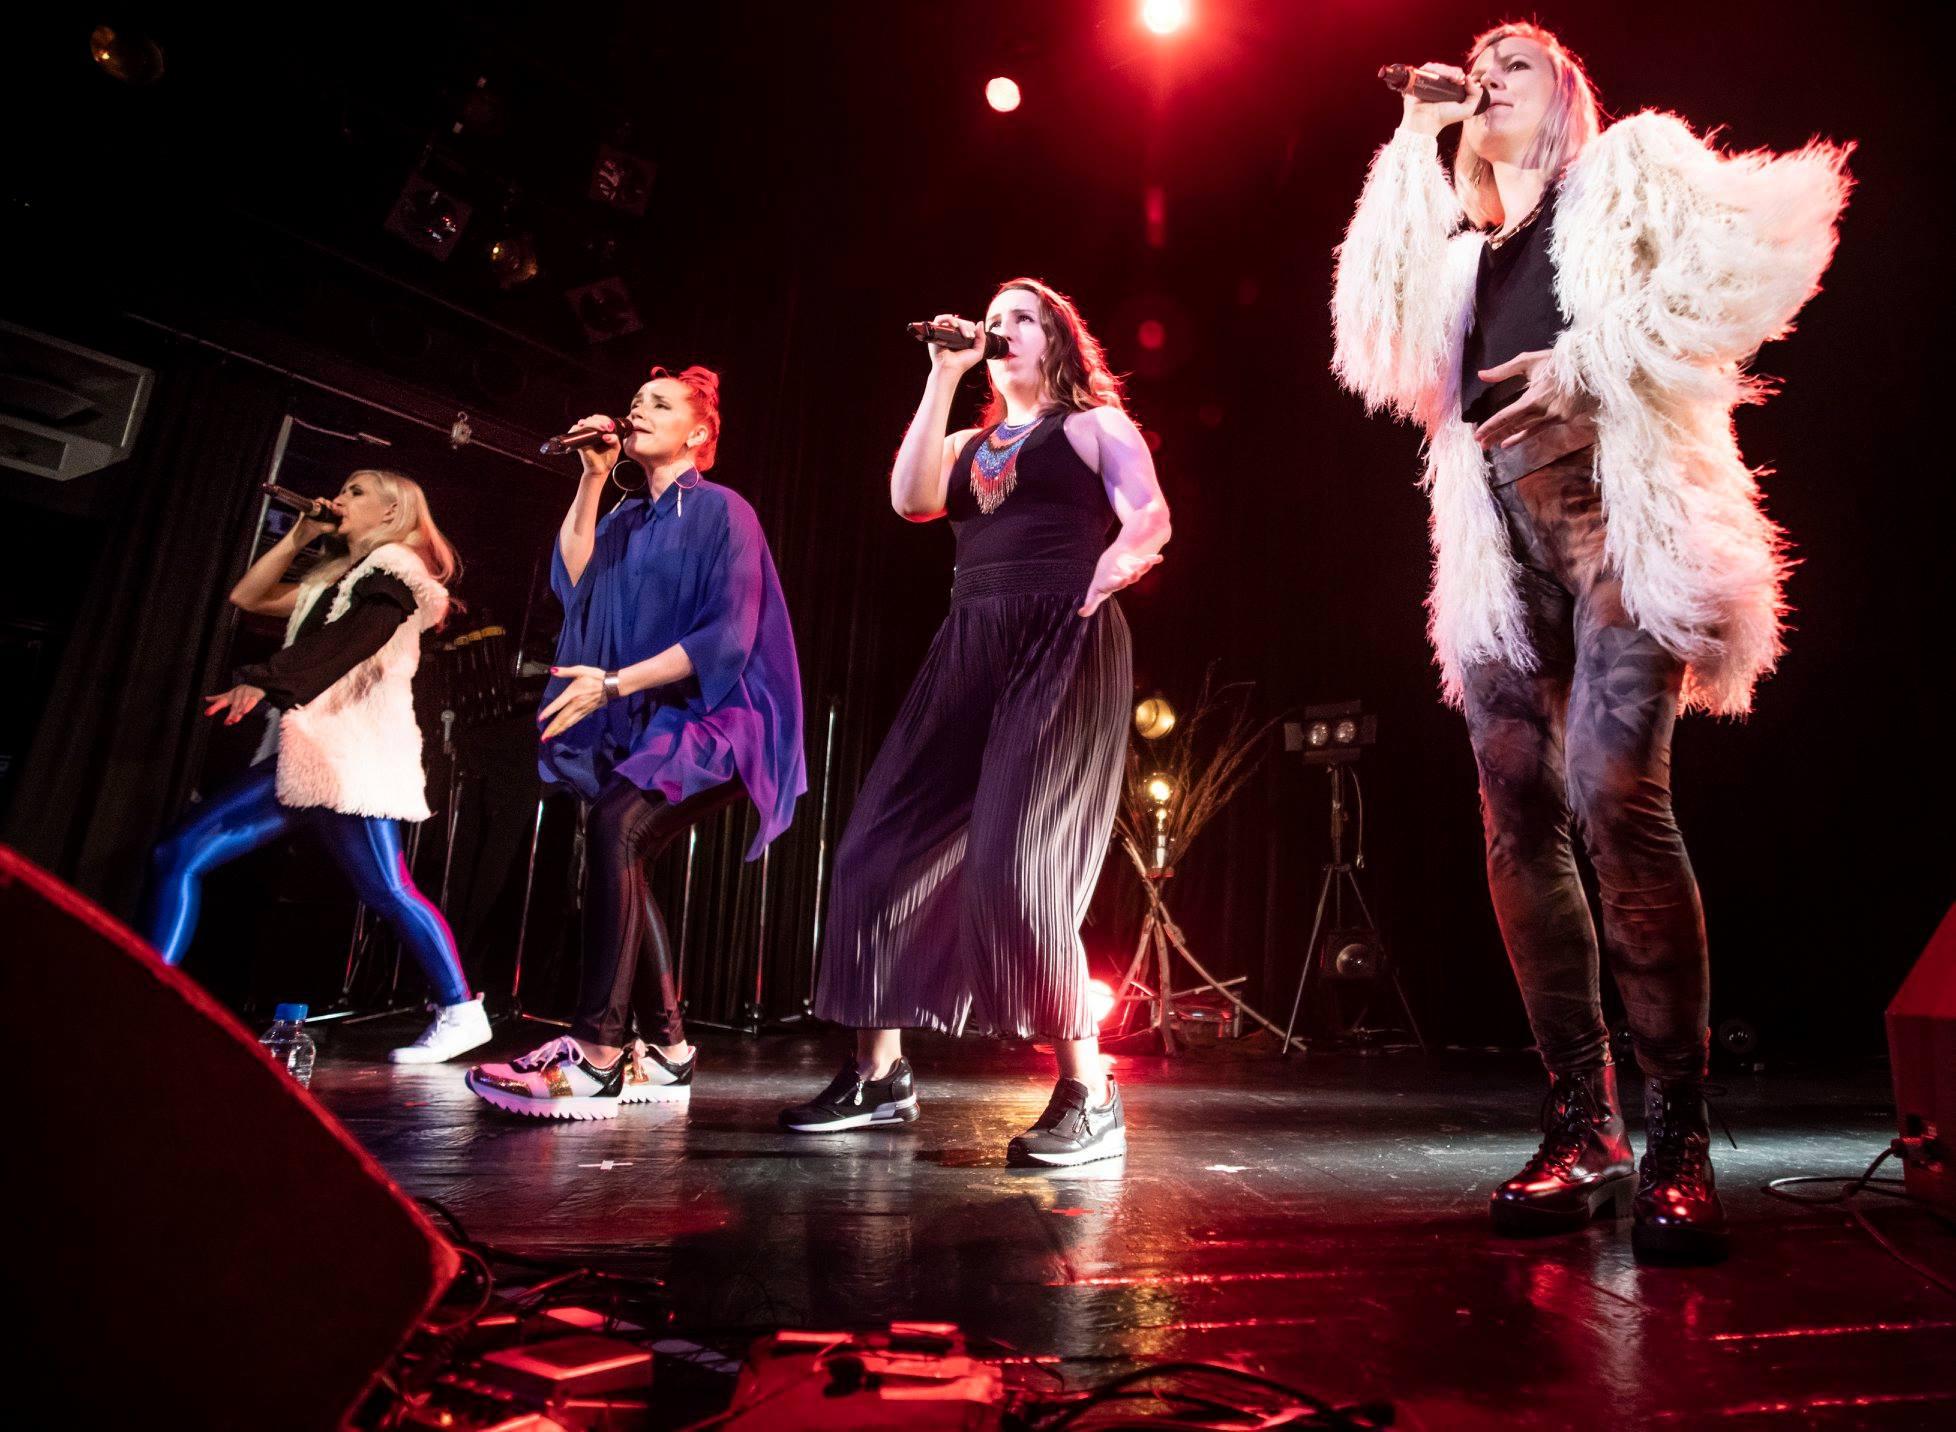 Tuuletar performing in Shibuya, Tokyo in May 2018. Picture Petri Artturi Asikainen